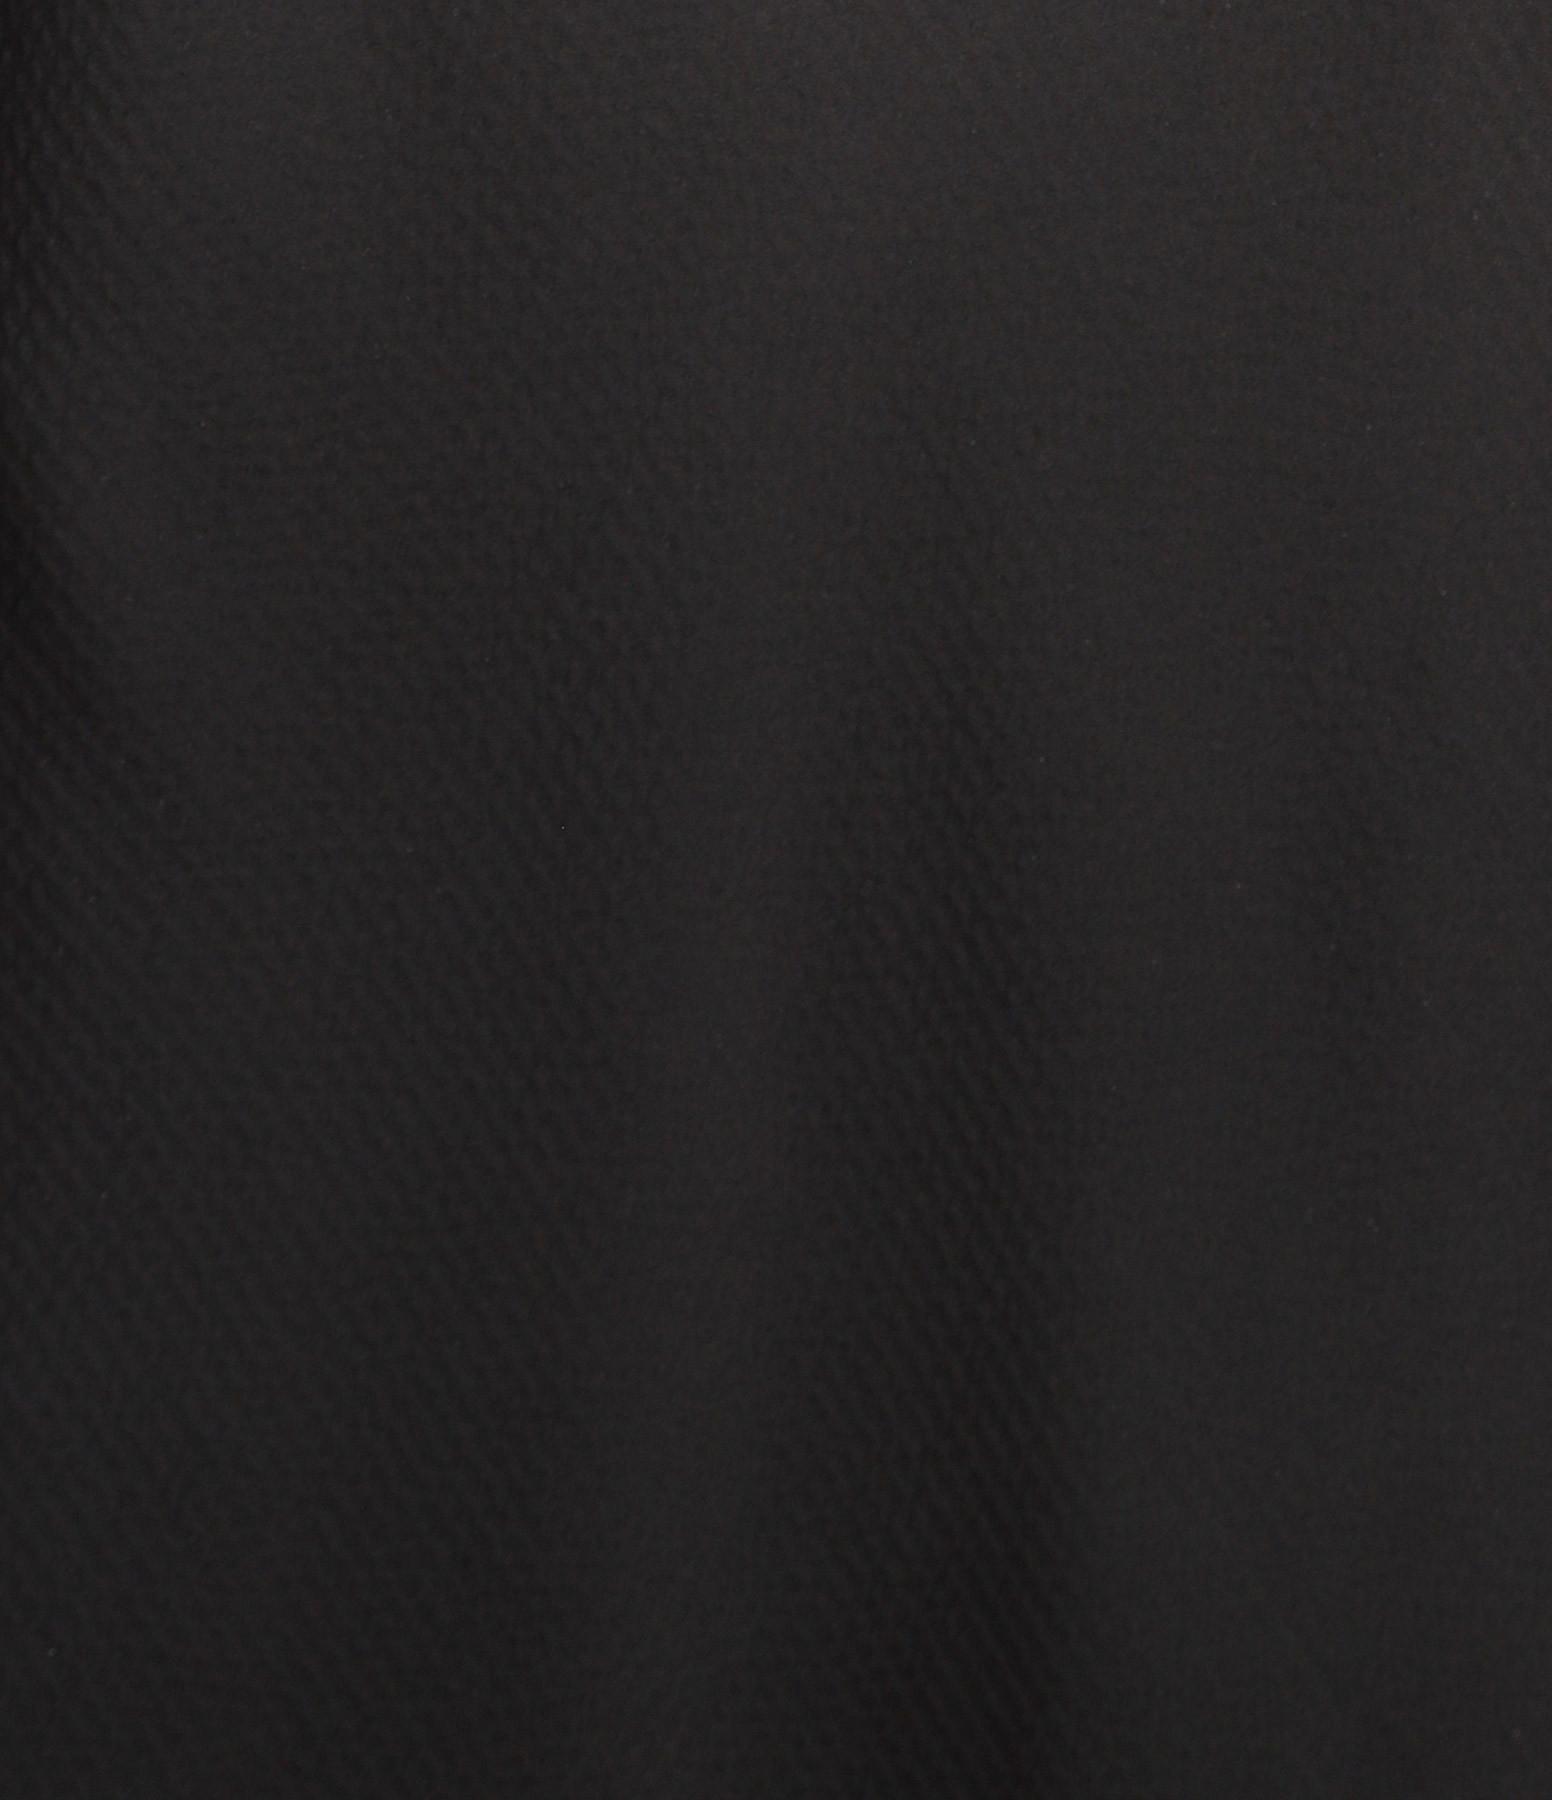 THEORY - Top Bretelles Noir